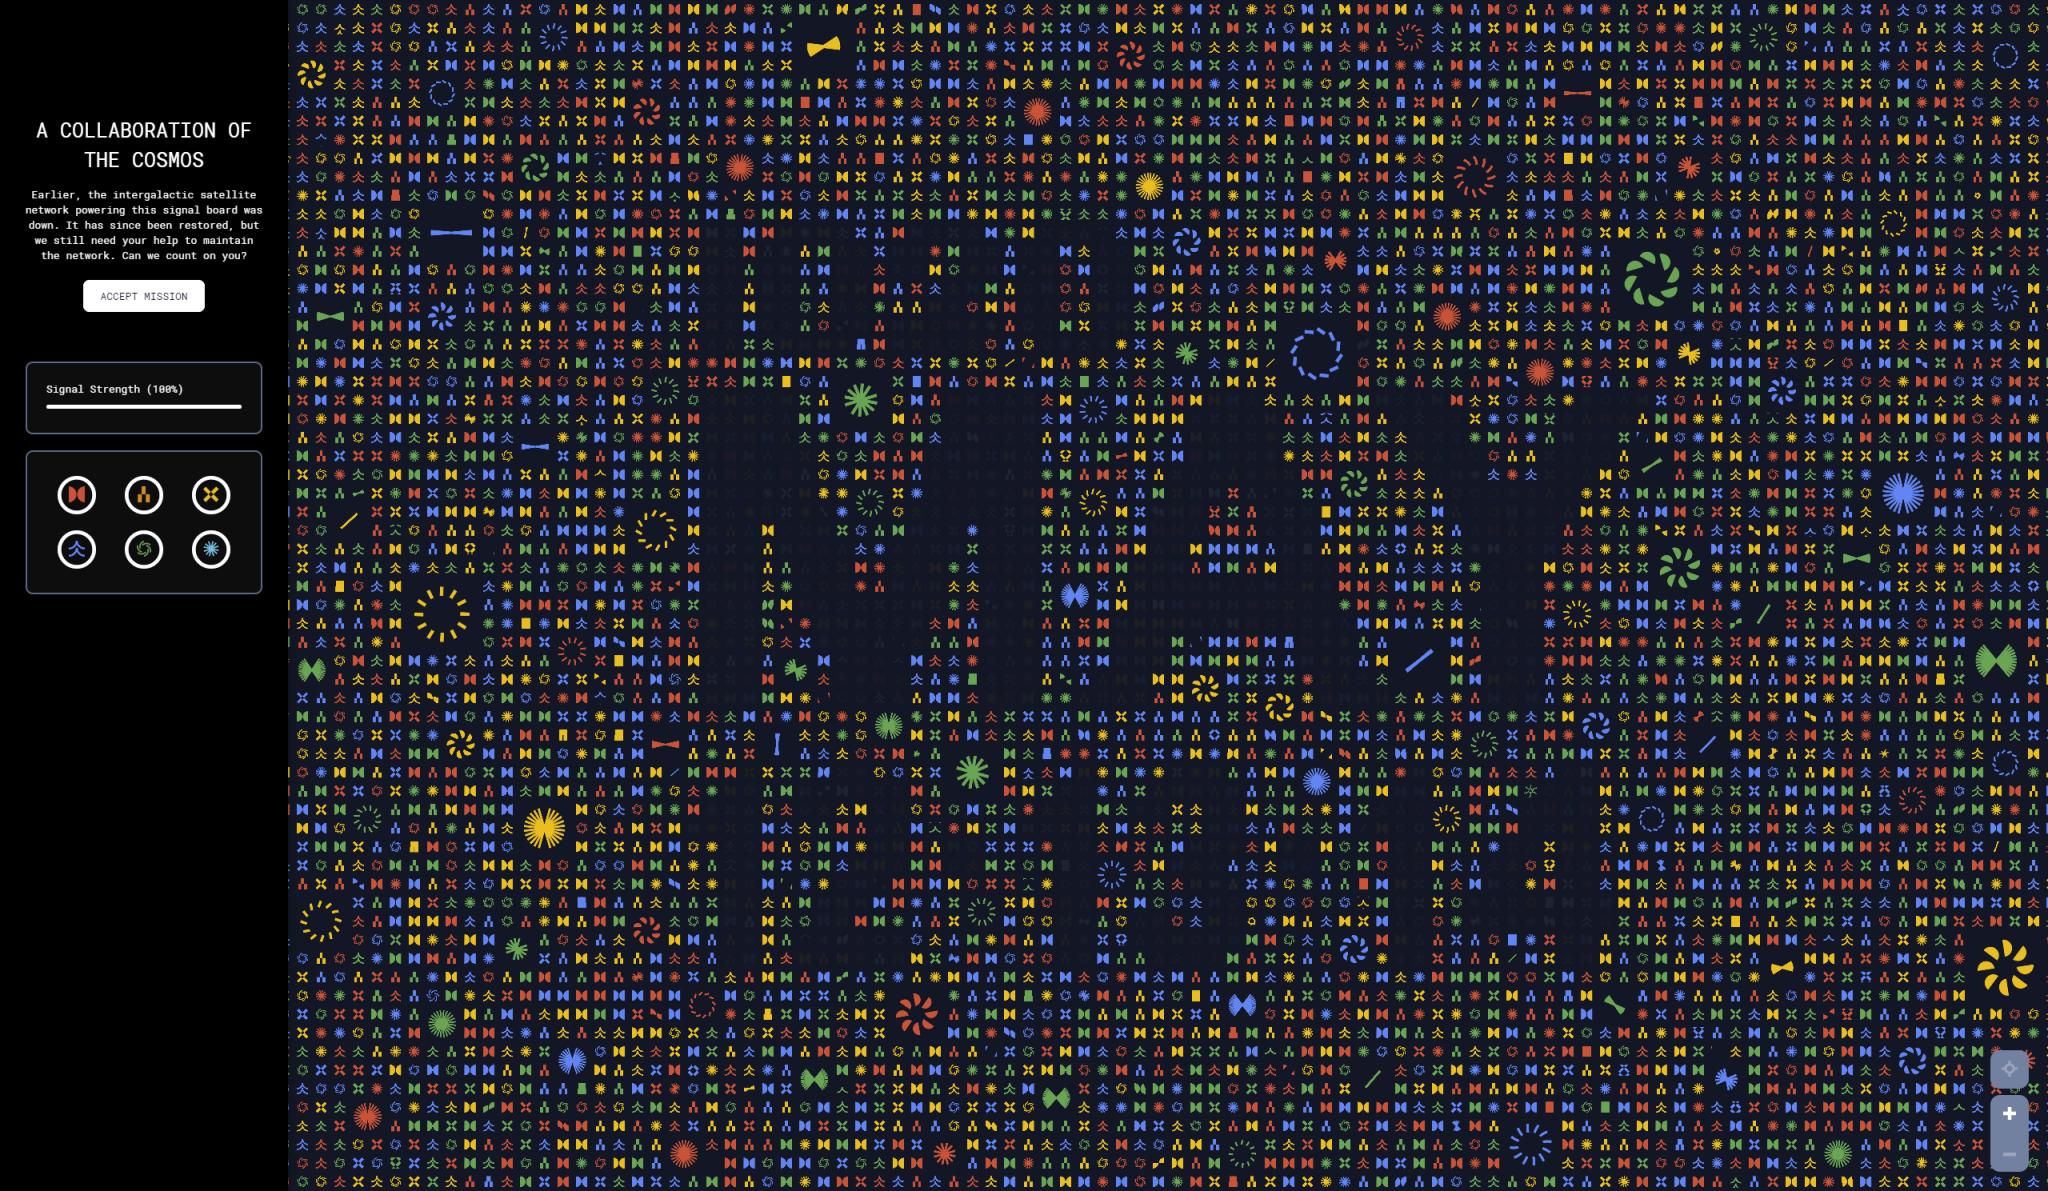 Google I/O 2020 si terrà dal 12 al 14 maggio a Mountain View thumbnail